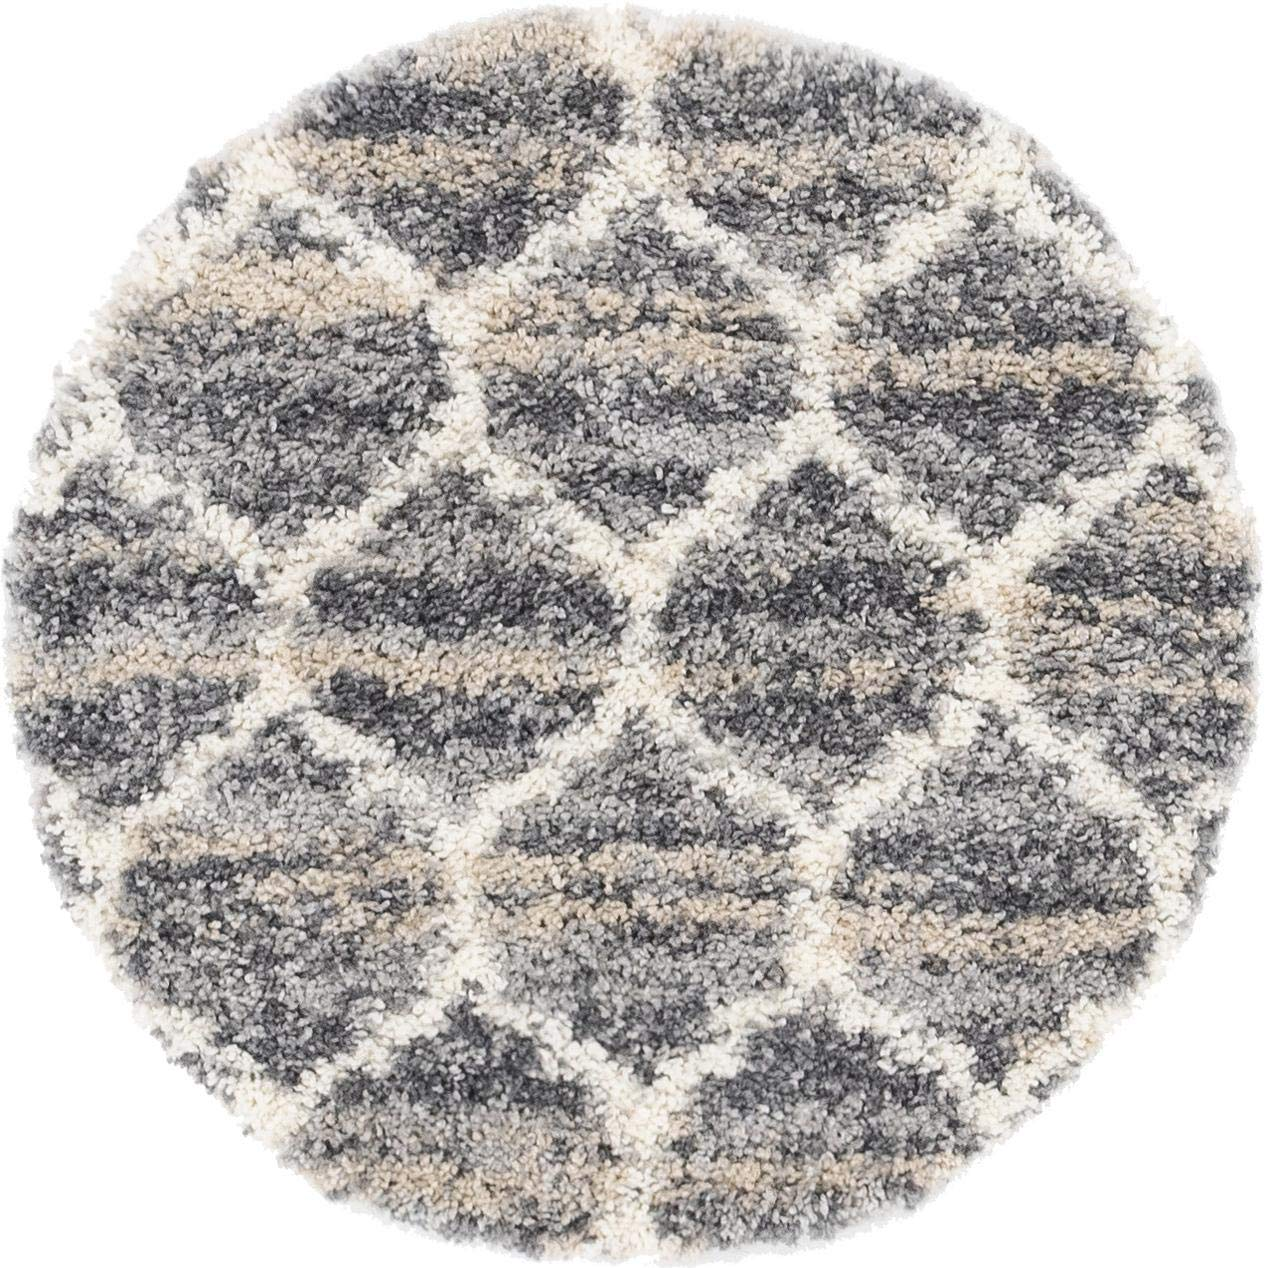 Unique Loom Hygge Shag Collection Lattice Trellis Plush Cozy Beige Round Rug 3 x 3